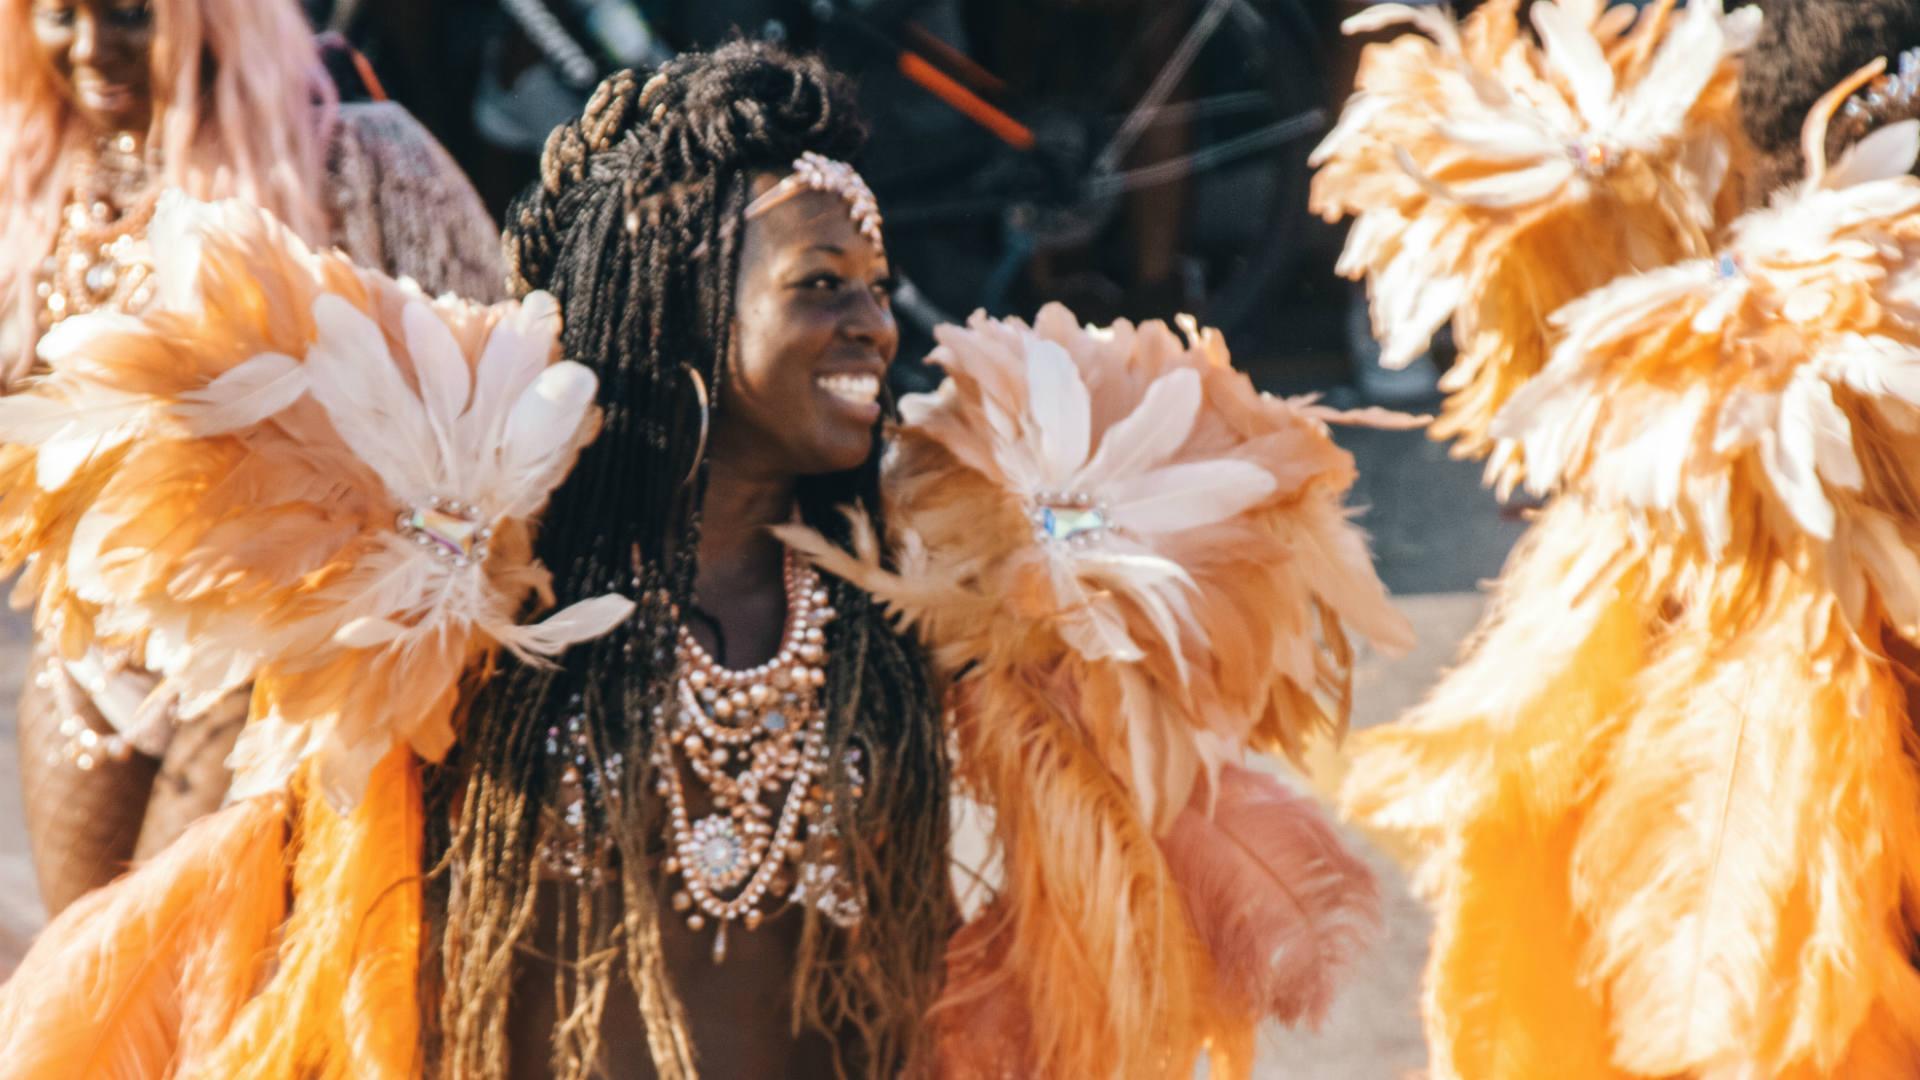 Caribana parade caribana costumes toronto music festivals in Toronto